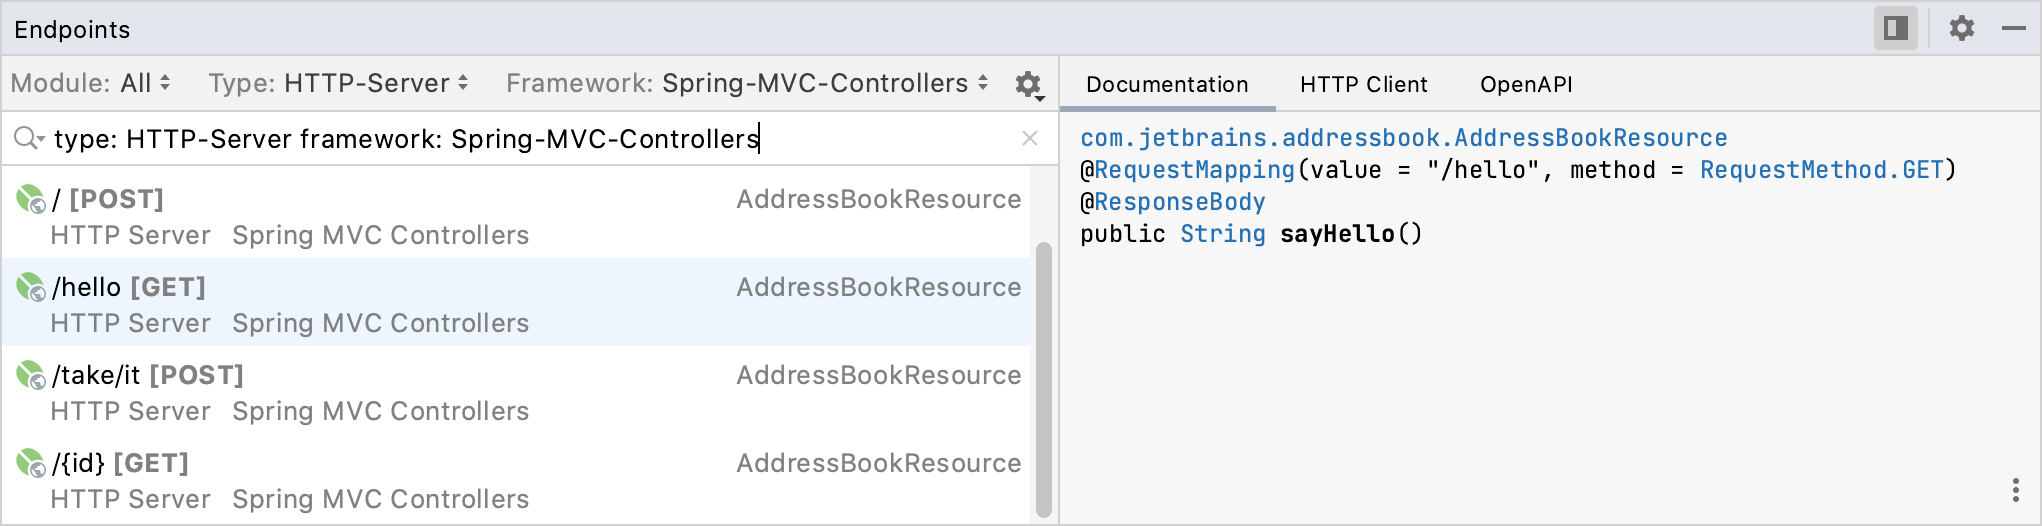 Endpoints tool window: Documentation tab